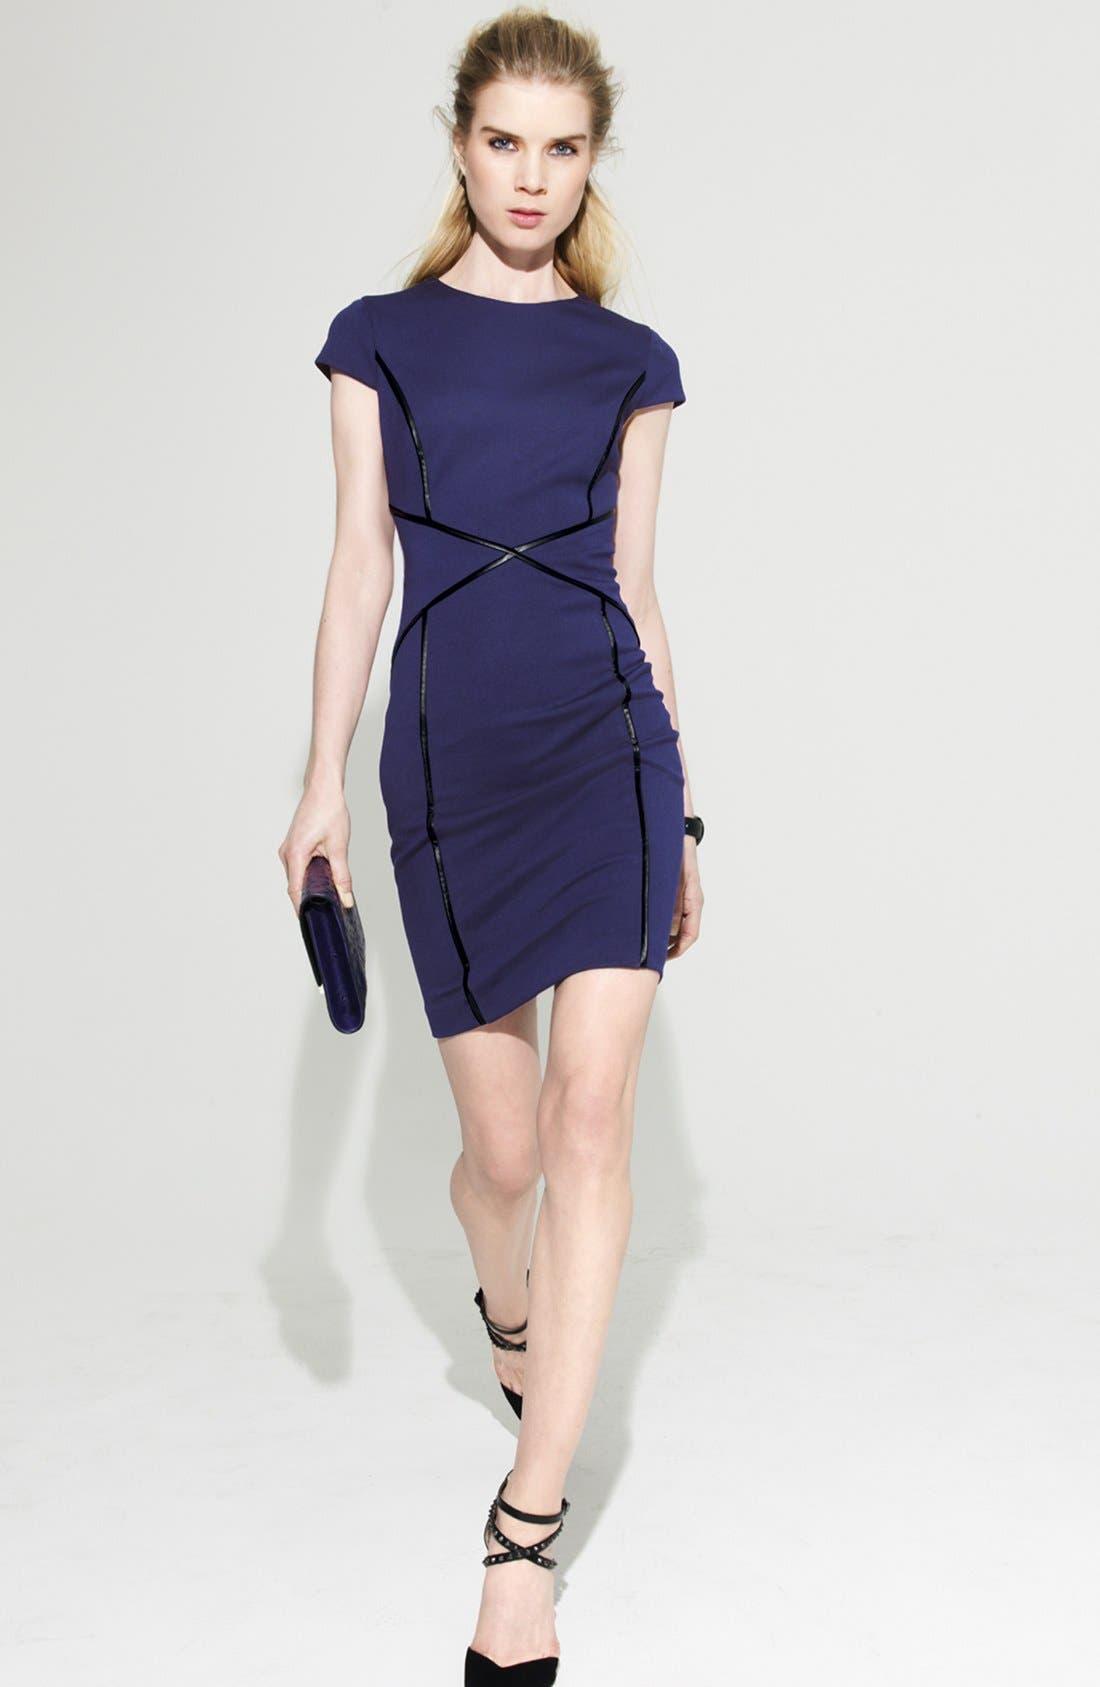 Main Image - Cynthia Steffe Sheath Dress & Accessories